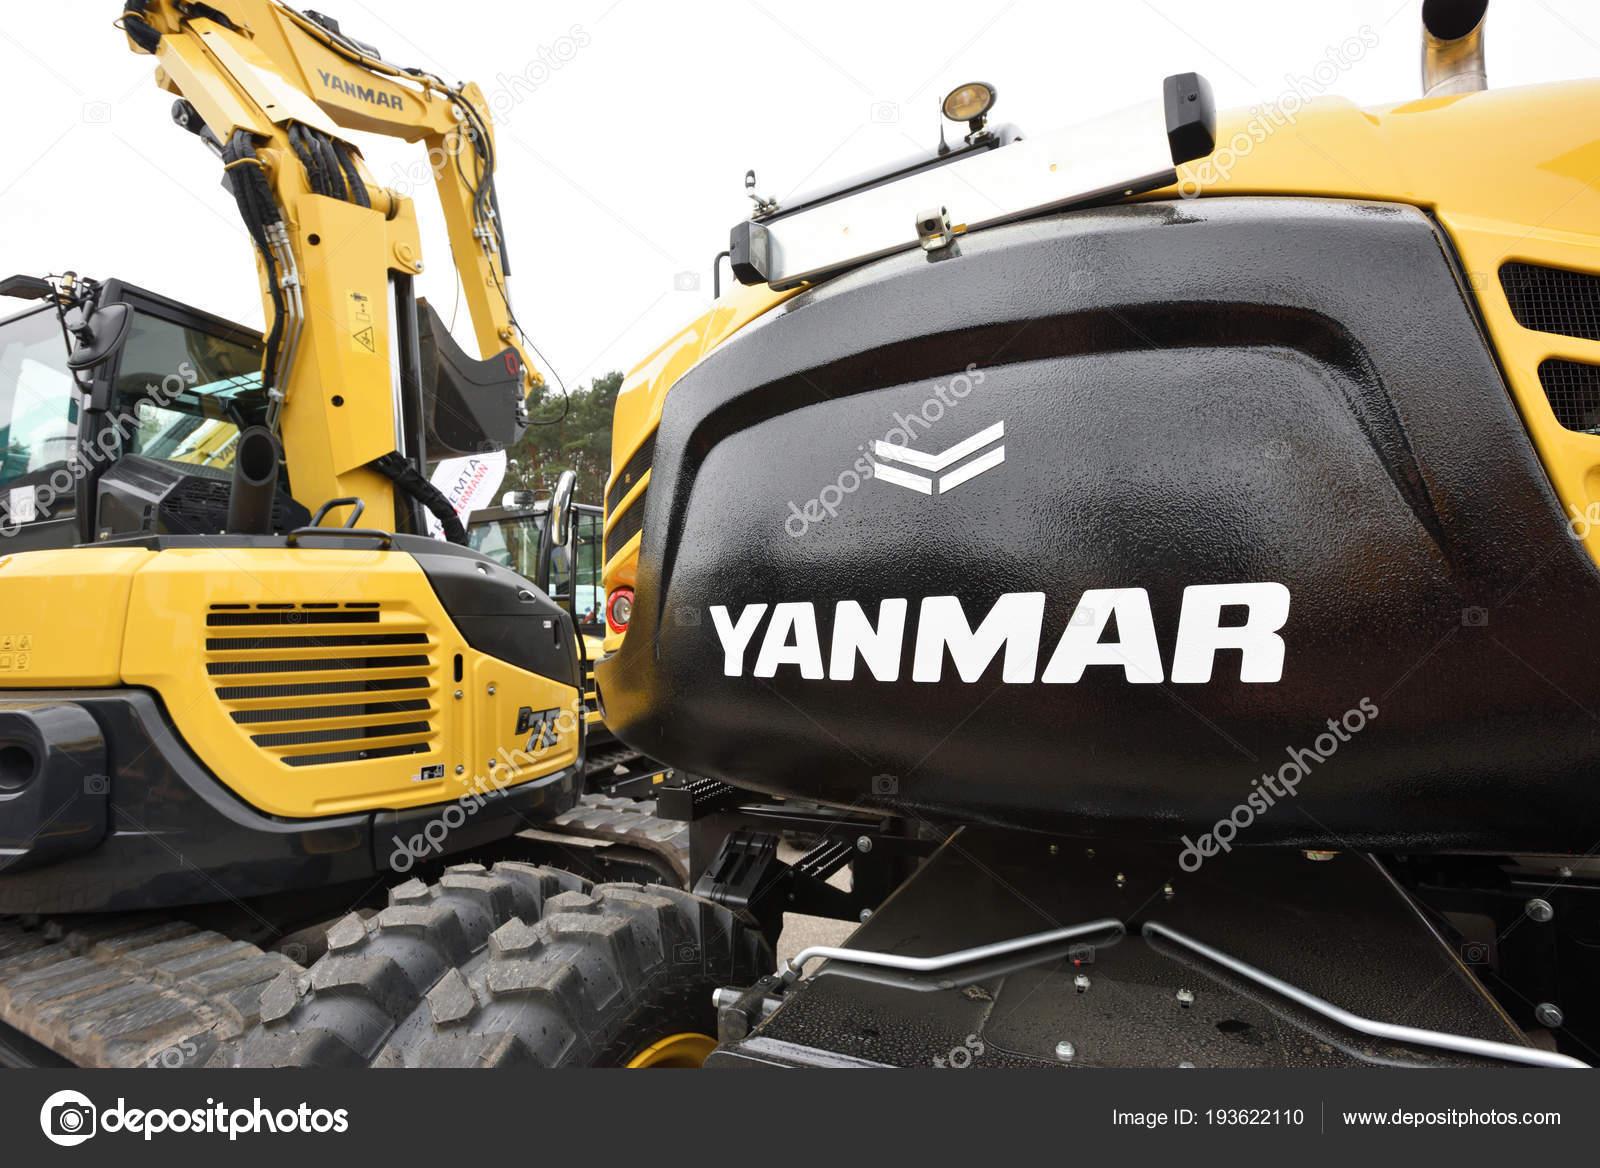 Yanmar excavator and logo – Stock Editorial Photo © _fla